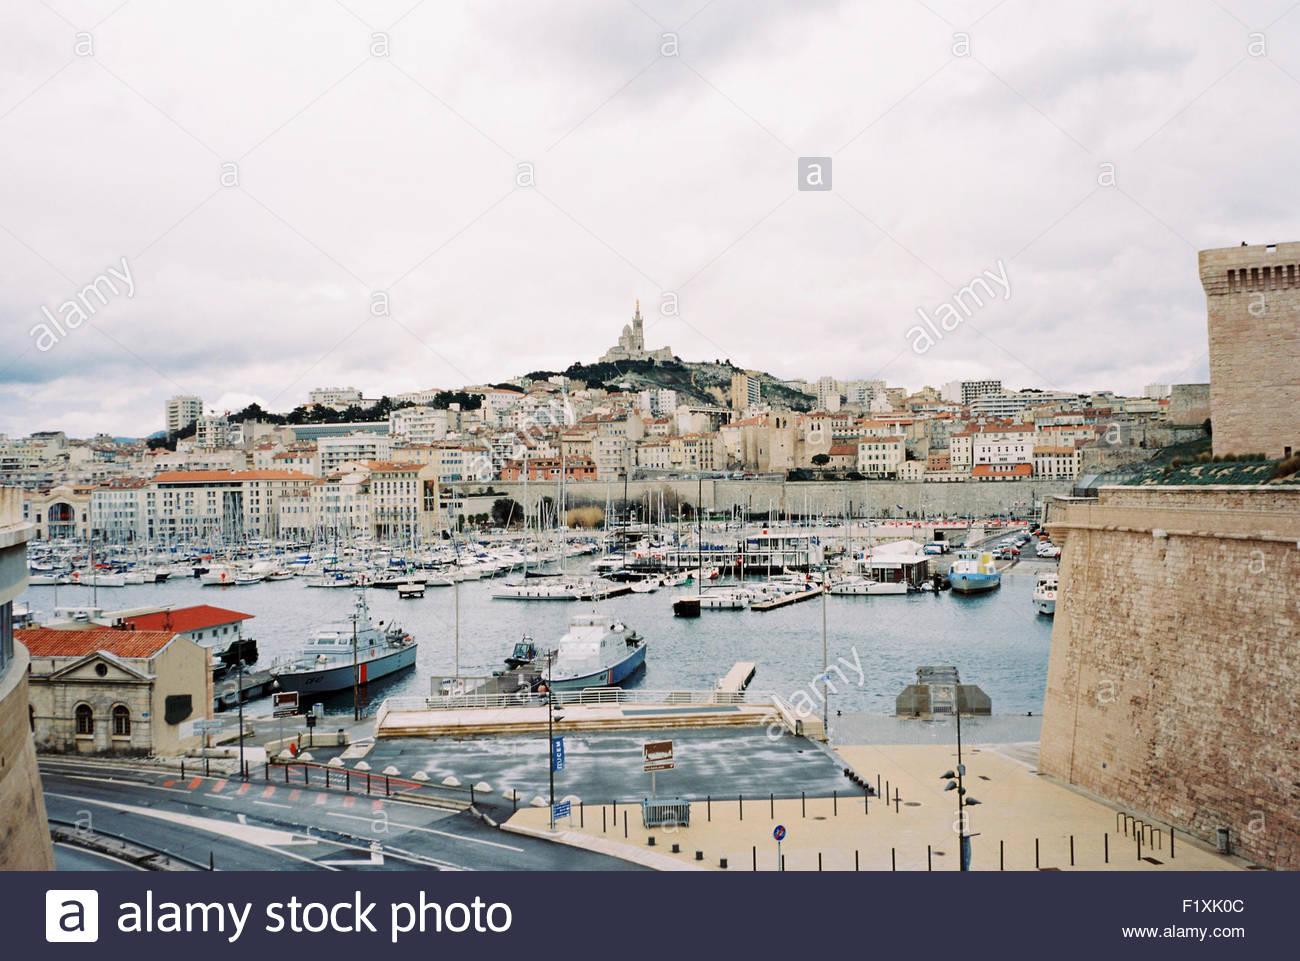 Marseille view the vieux port and over notre dame de la garde stock photo royalty free image - Pharmacie de garde marseille vieux port ...